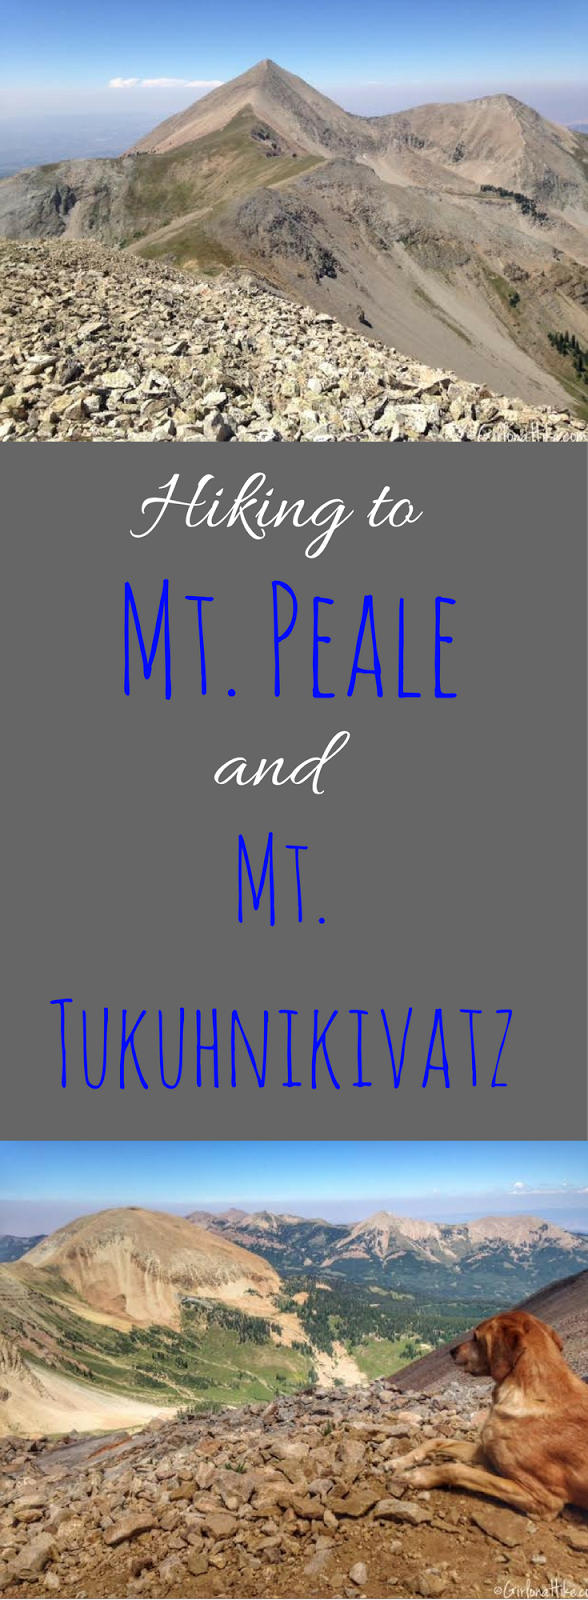 Hiking to Mt. Peale & Mt. Tukuhnikivatz